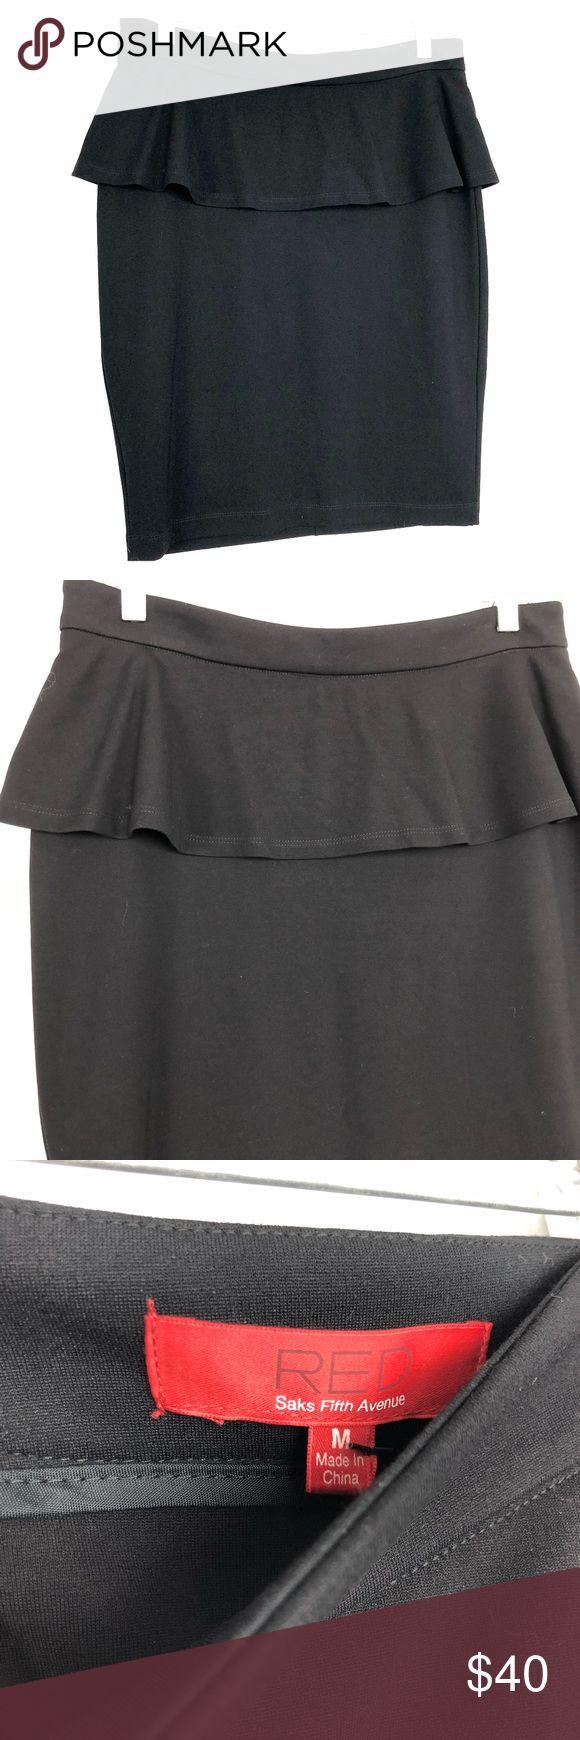 "Red Saks 5th Avenue Black Peplum Skirt NWT Red Saks 5th Avenue Black Peplum Skirt. NWT.  Approx 22"" length.  Rayon/Nylon/Spandex.  J2. Saks Fifth Avenue Skirts Pencil"